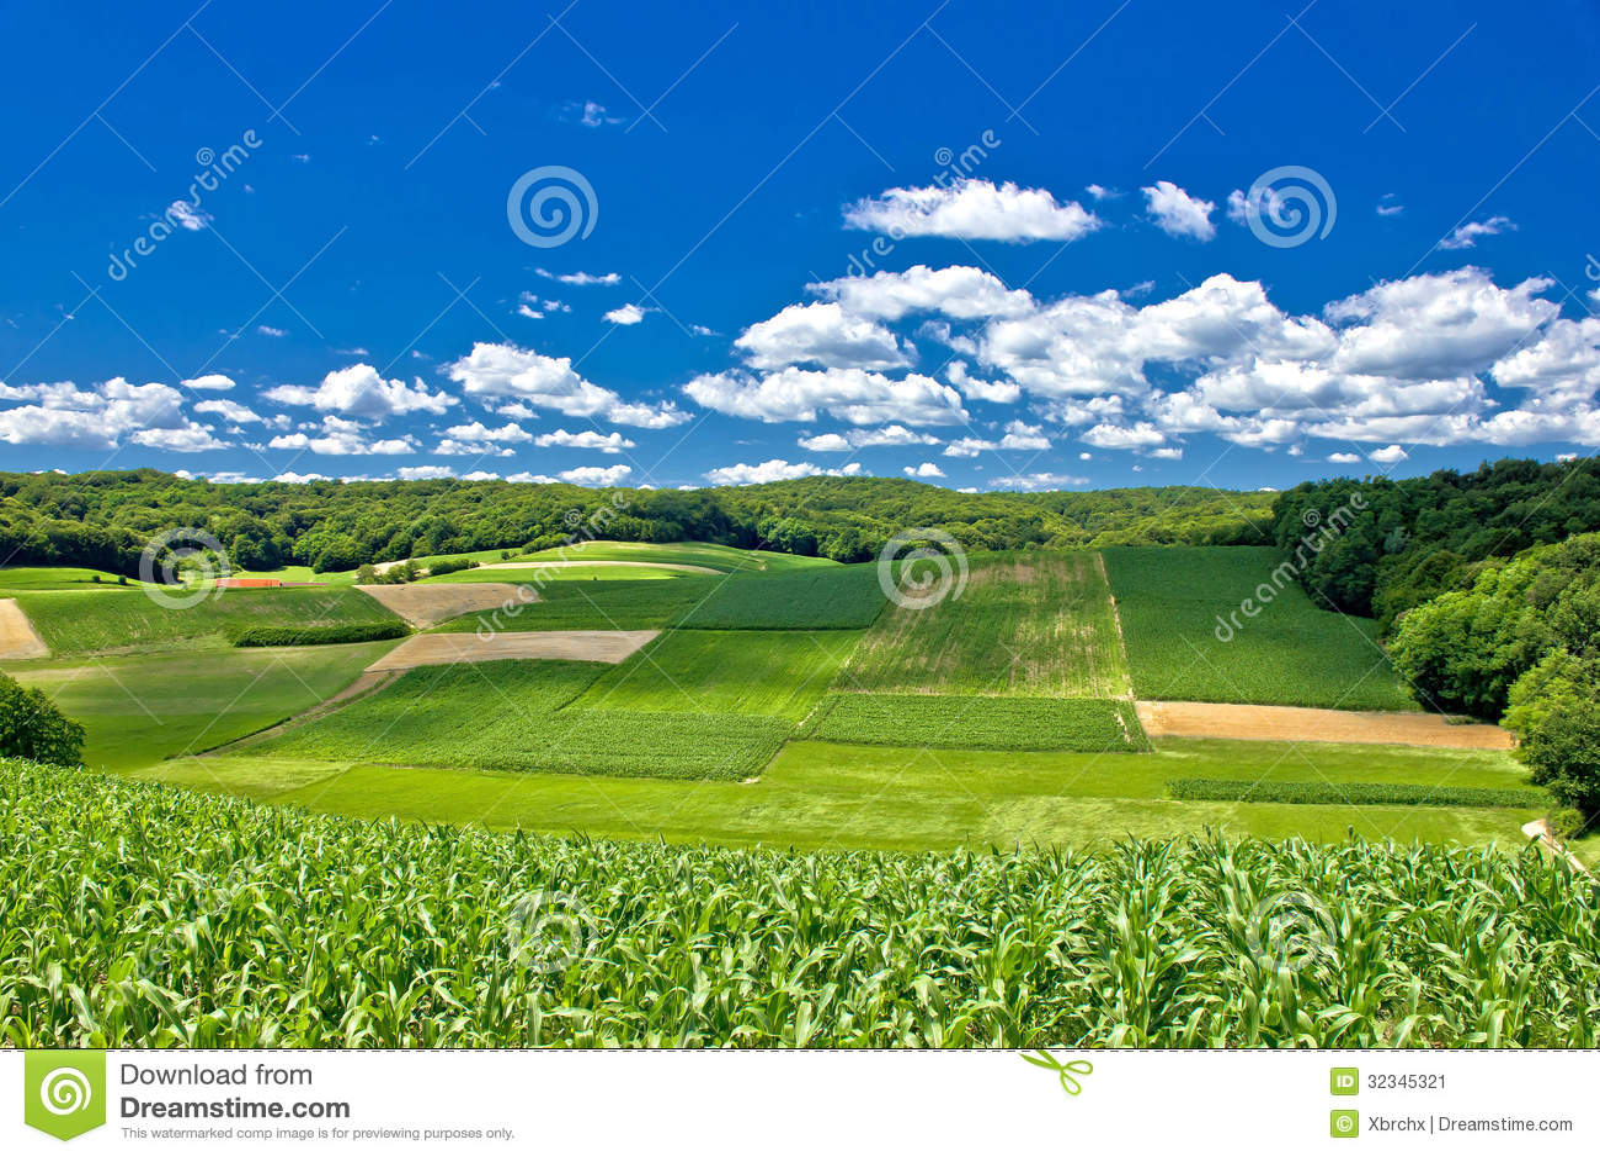 Beau paysage agricole vert en croatie image stock image for Paysage vert